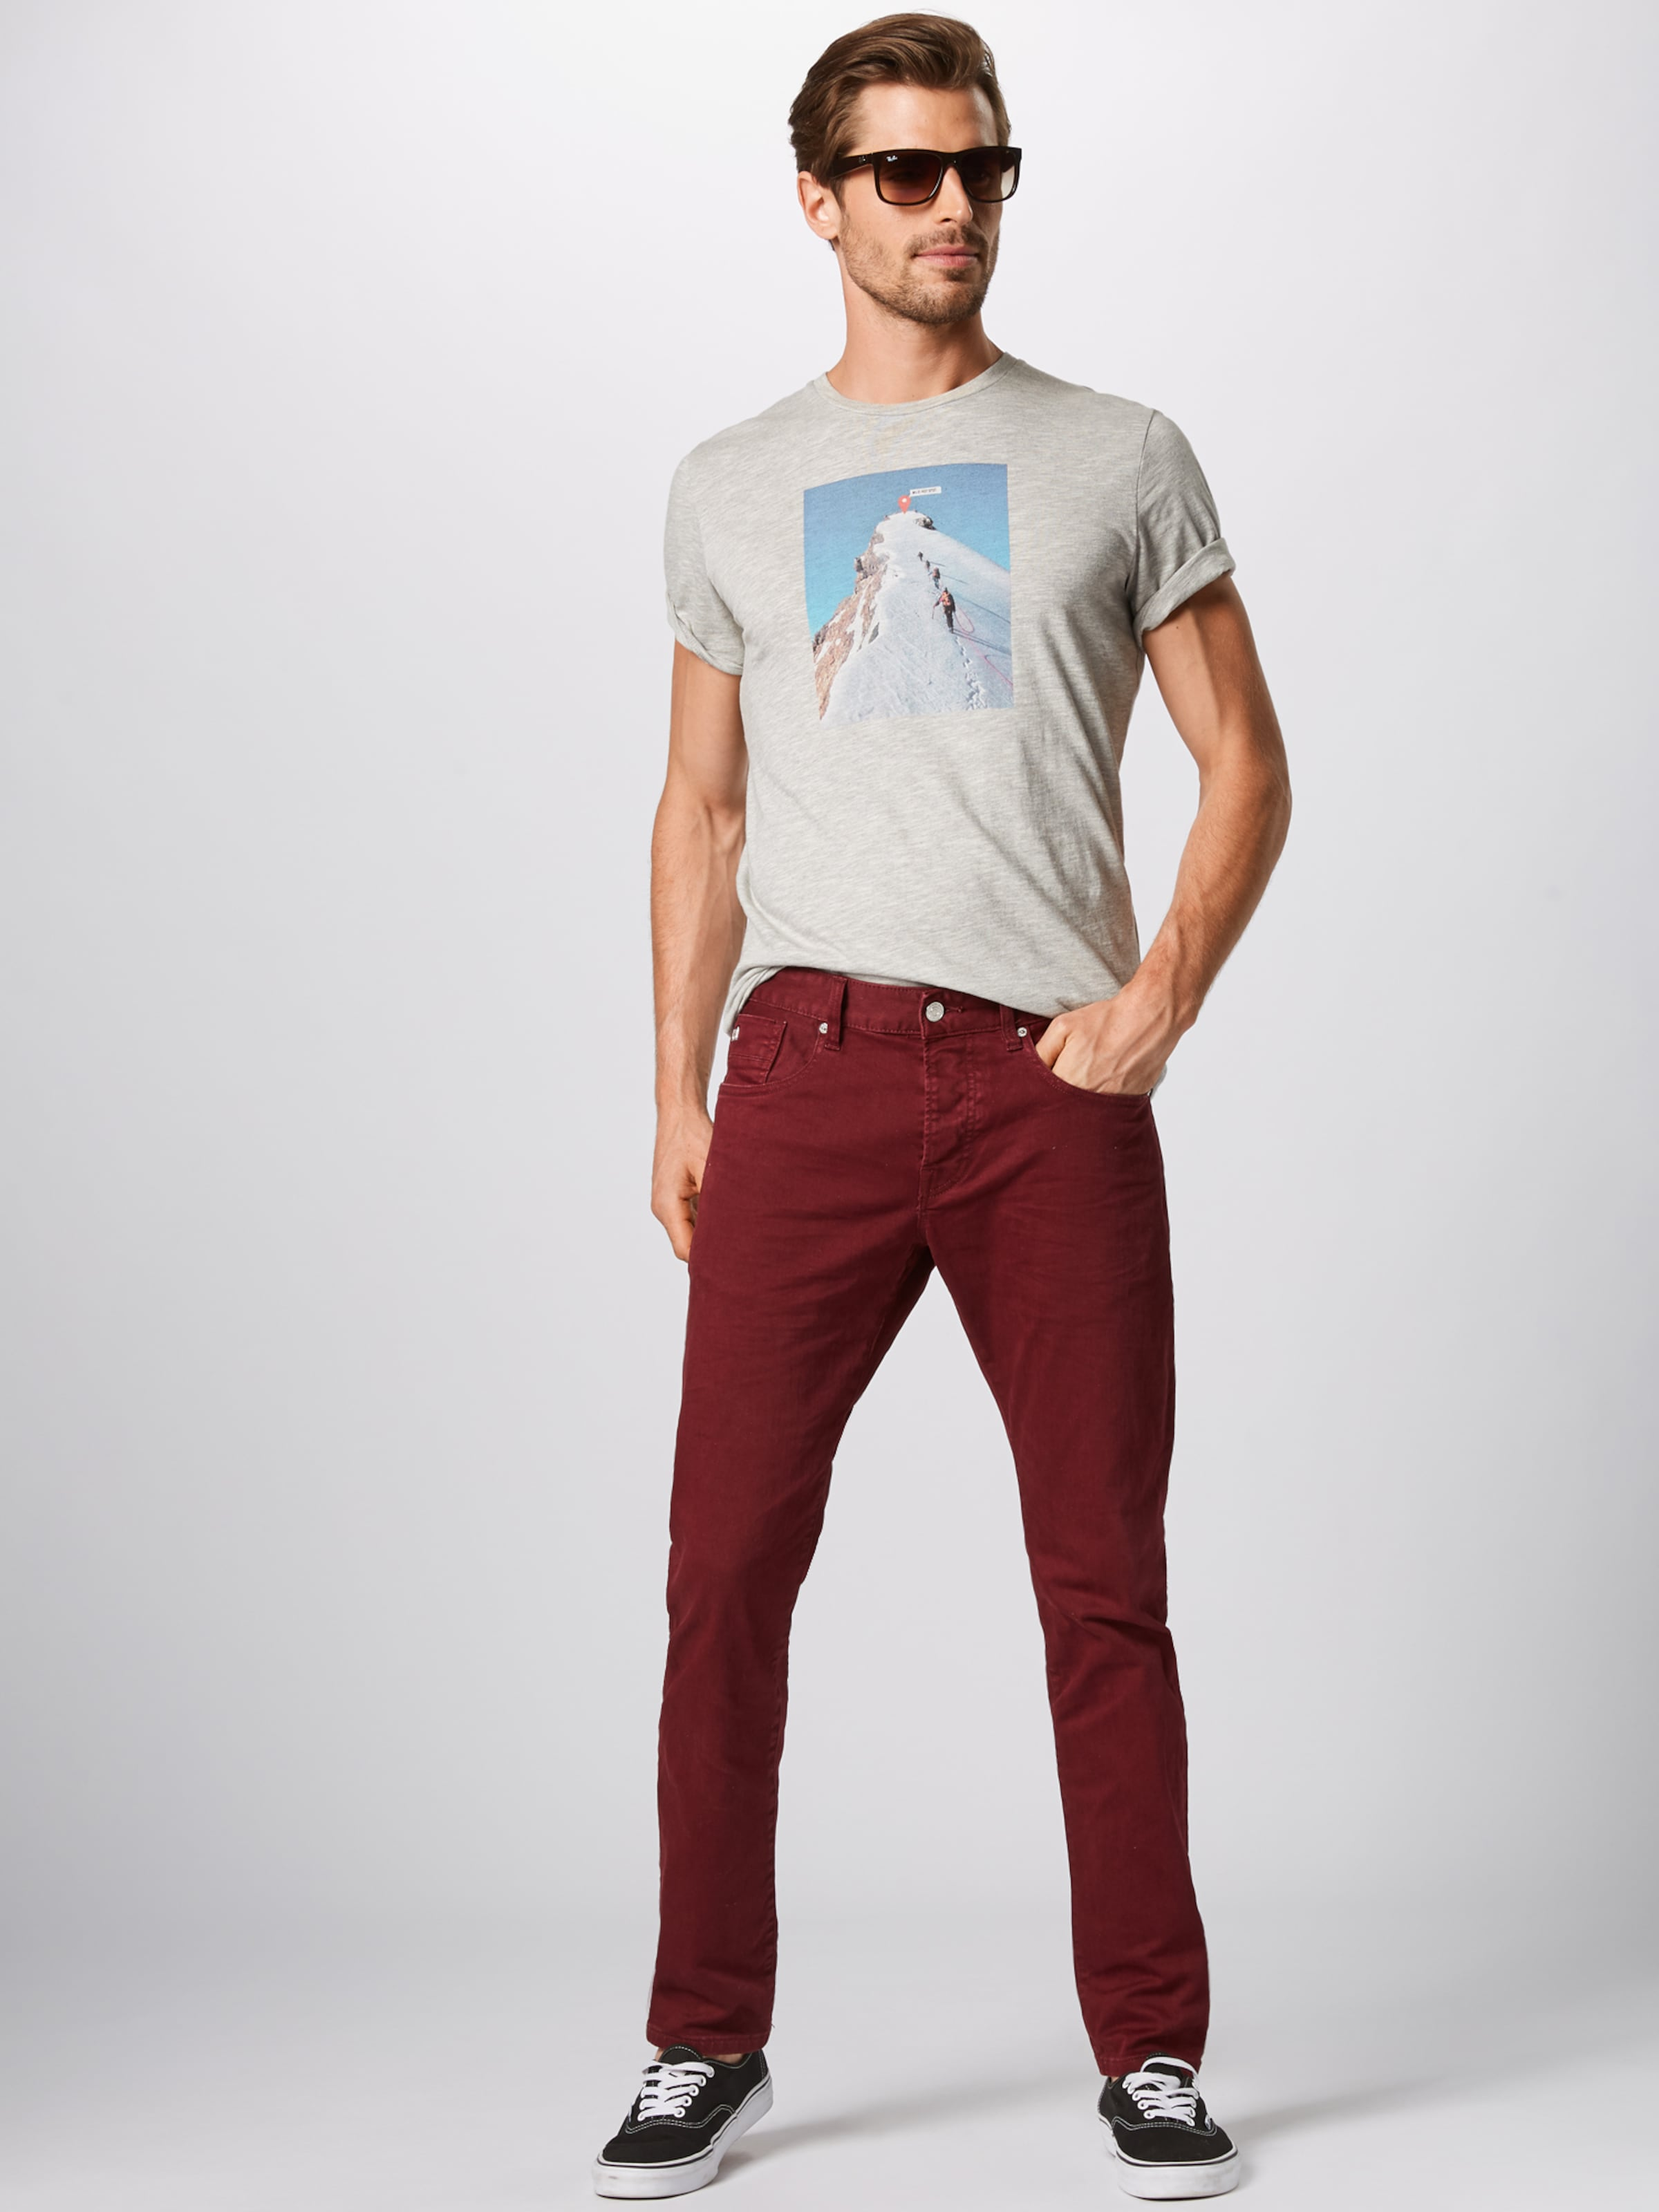 Jones Jackamp; En shirt T BleuGris Chiné qMzVSpU